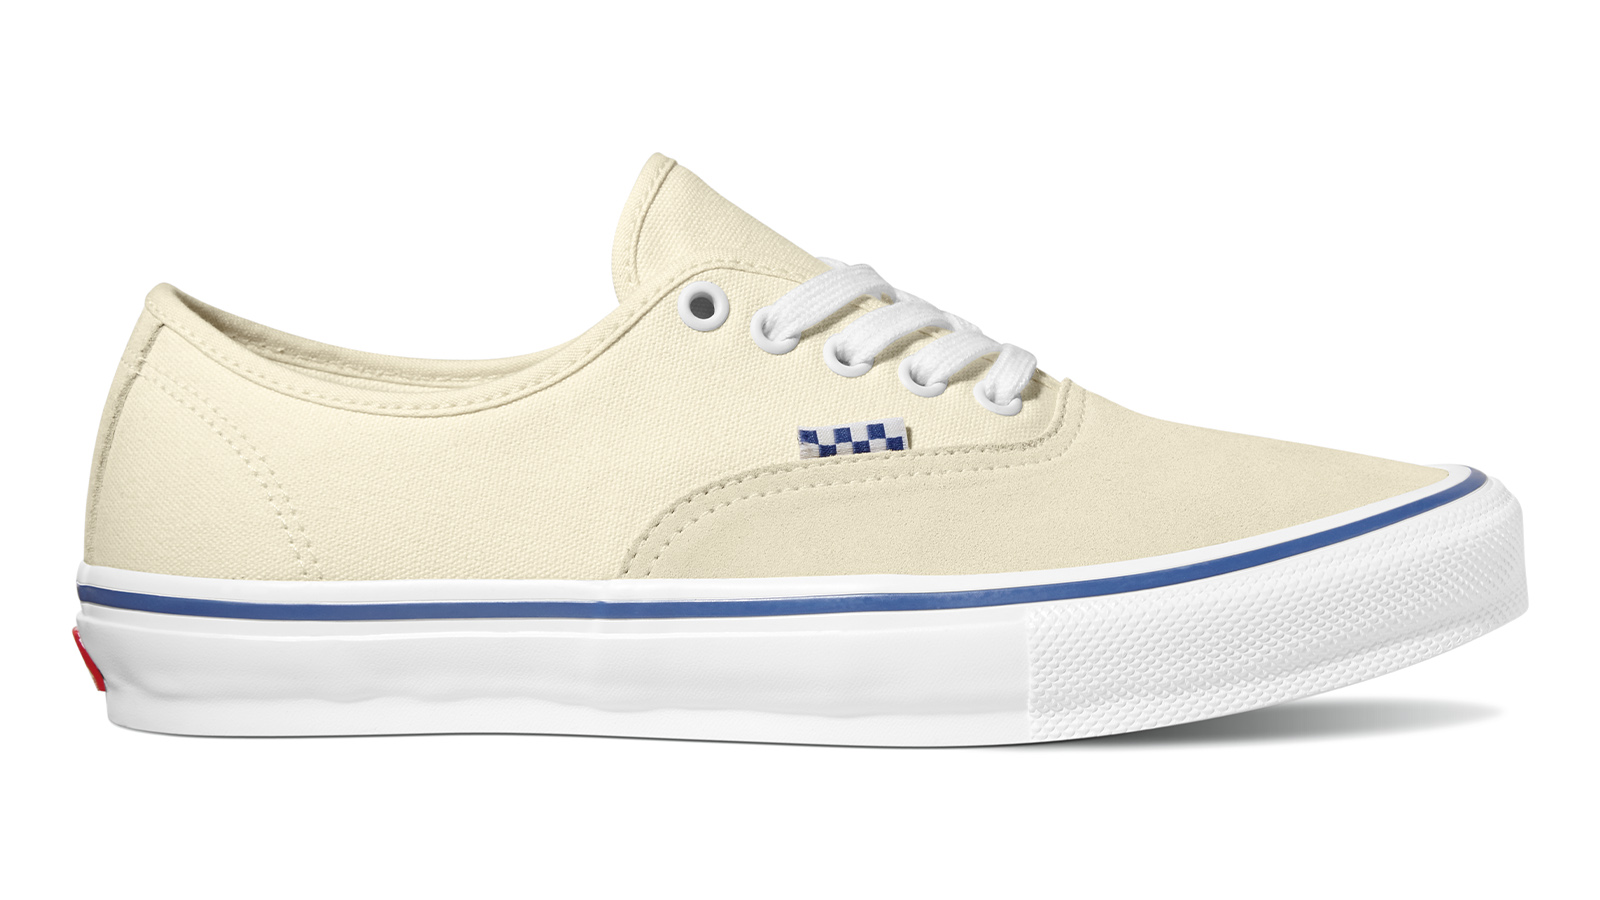 Vans SS21 Skate Shoes Preview - Boardsport SOURCE